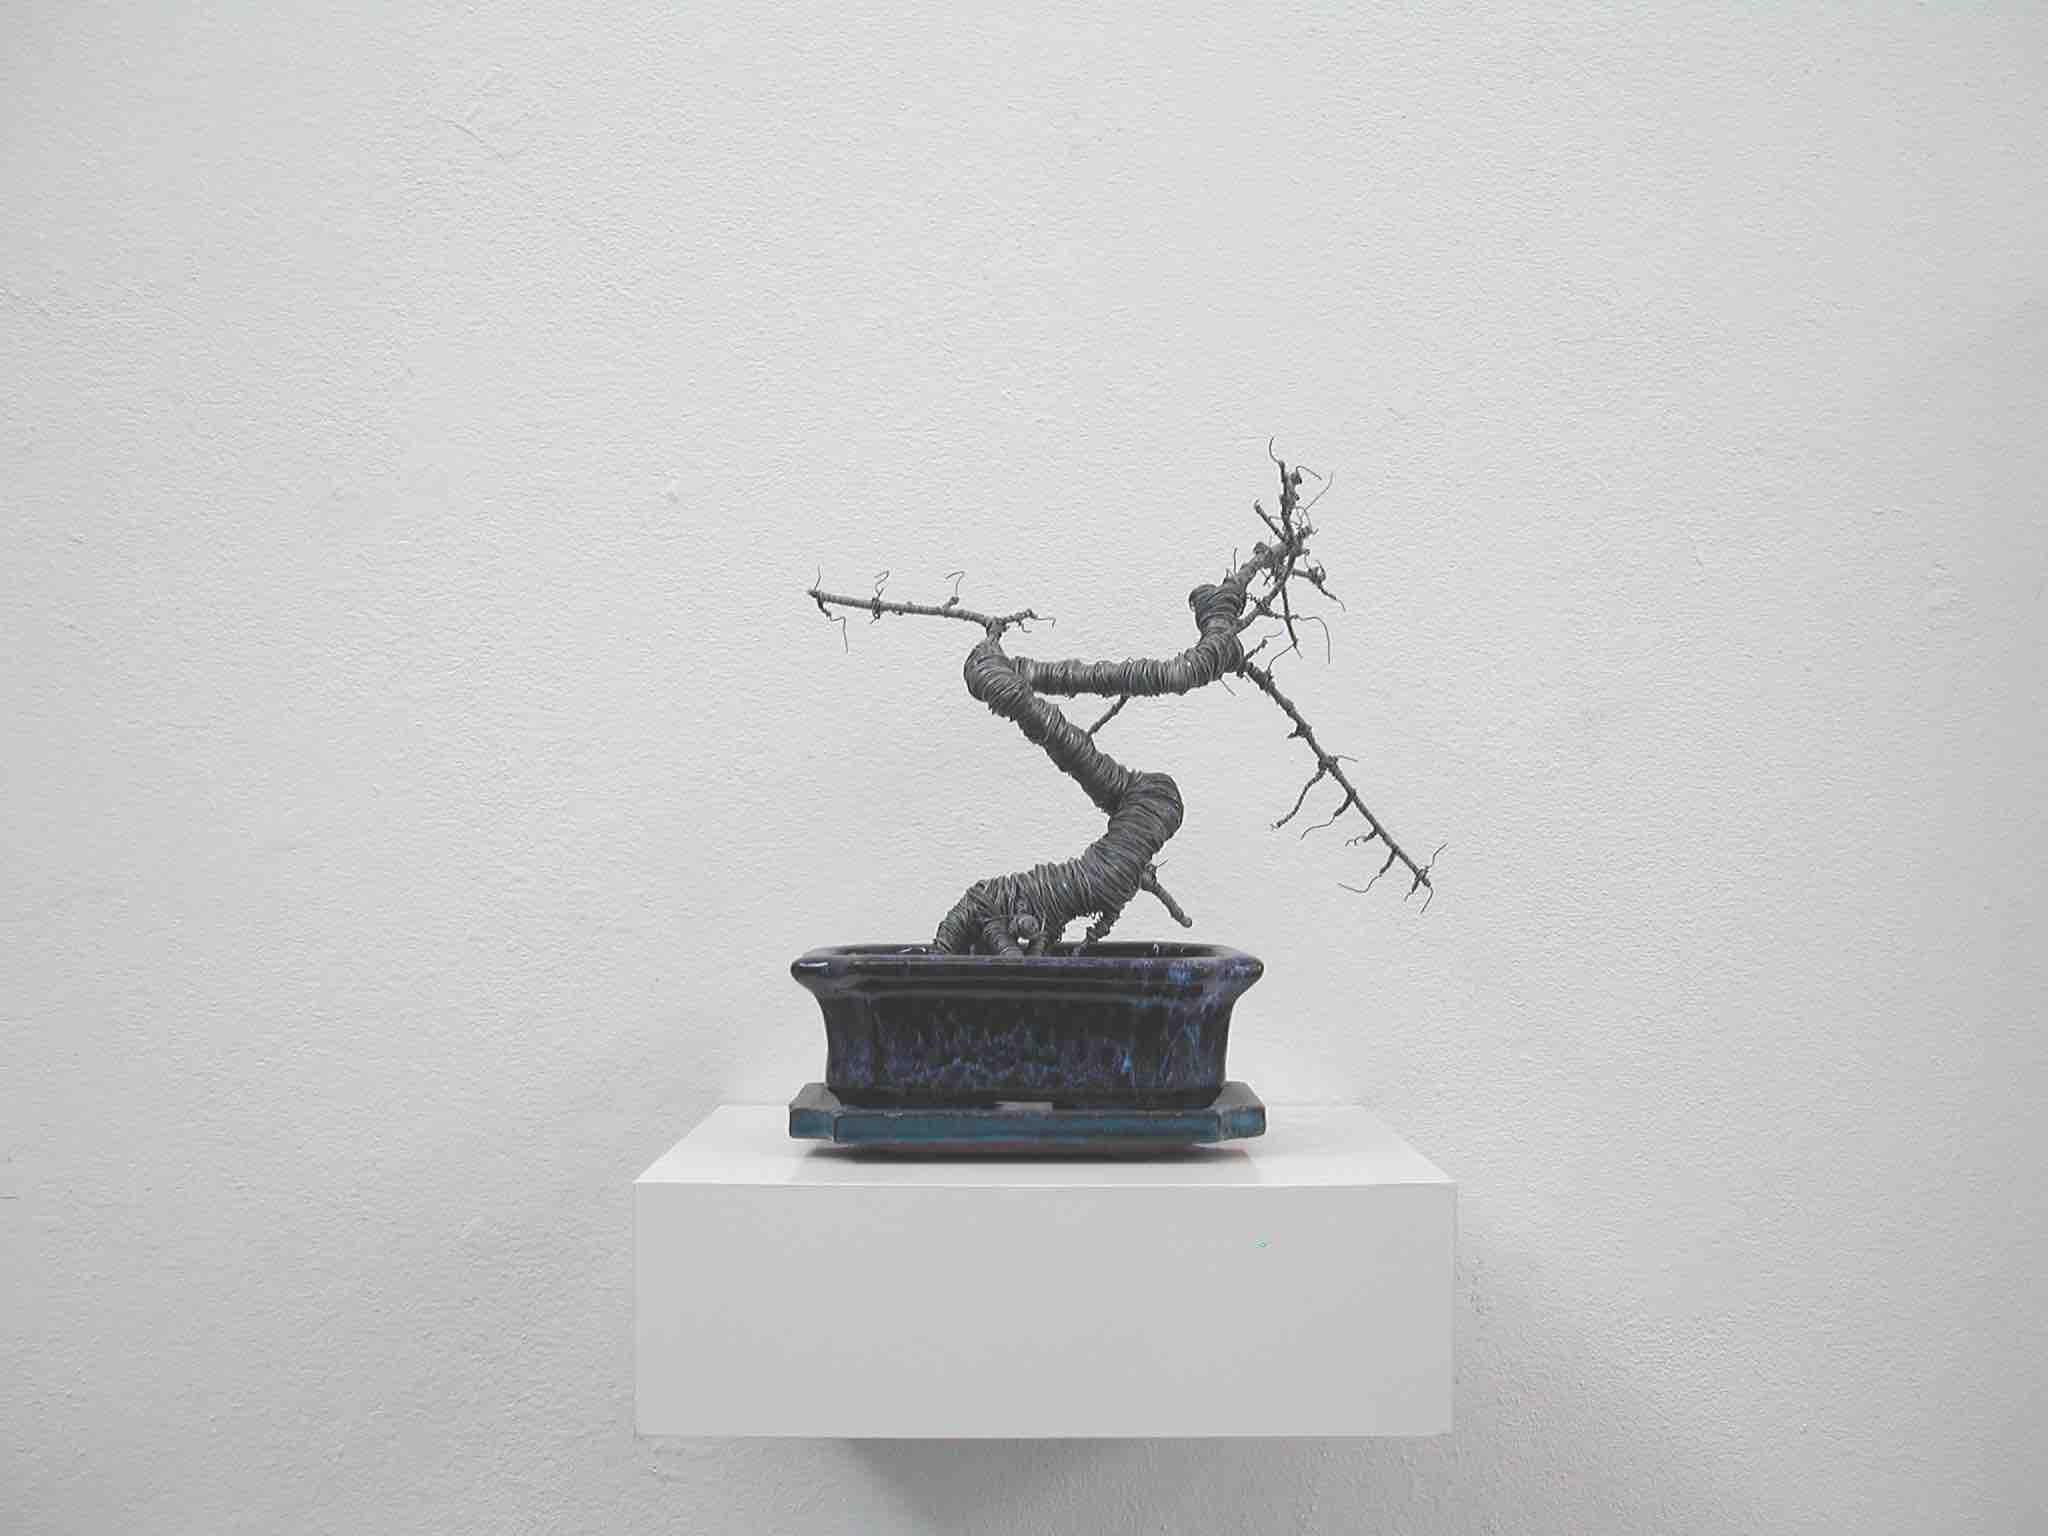 Andreas Kaiser, Draht, Bonsai,2009, mixed media, 30x25x25cm, courtesy Galerie Seippel Köln.jpg